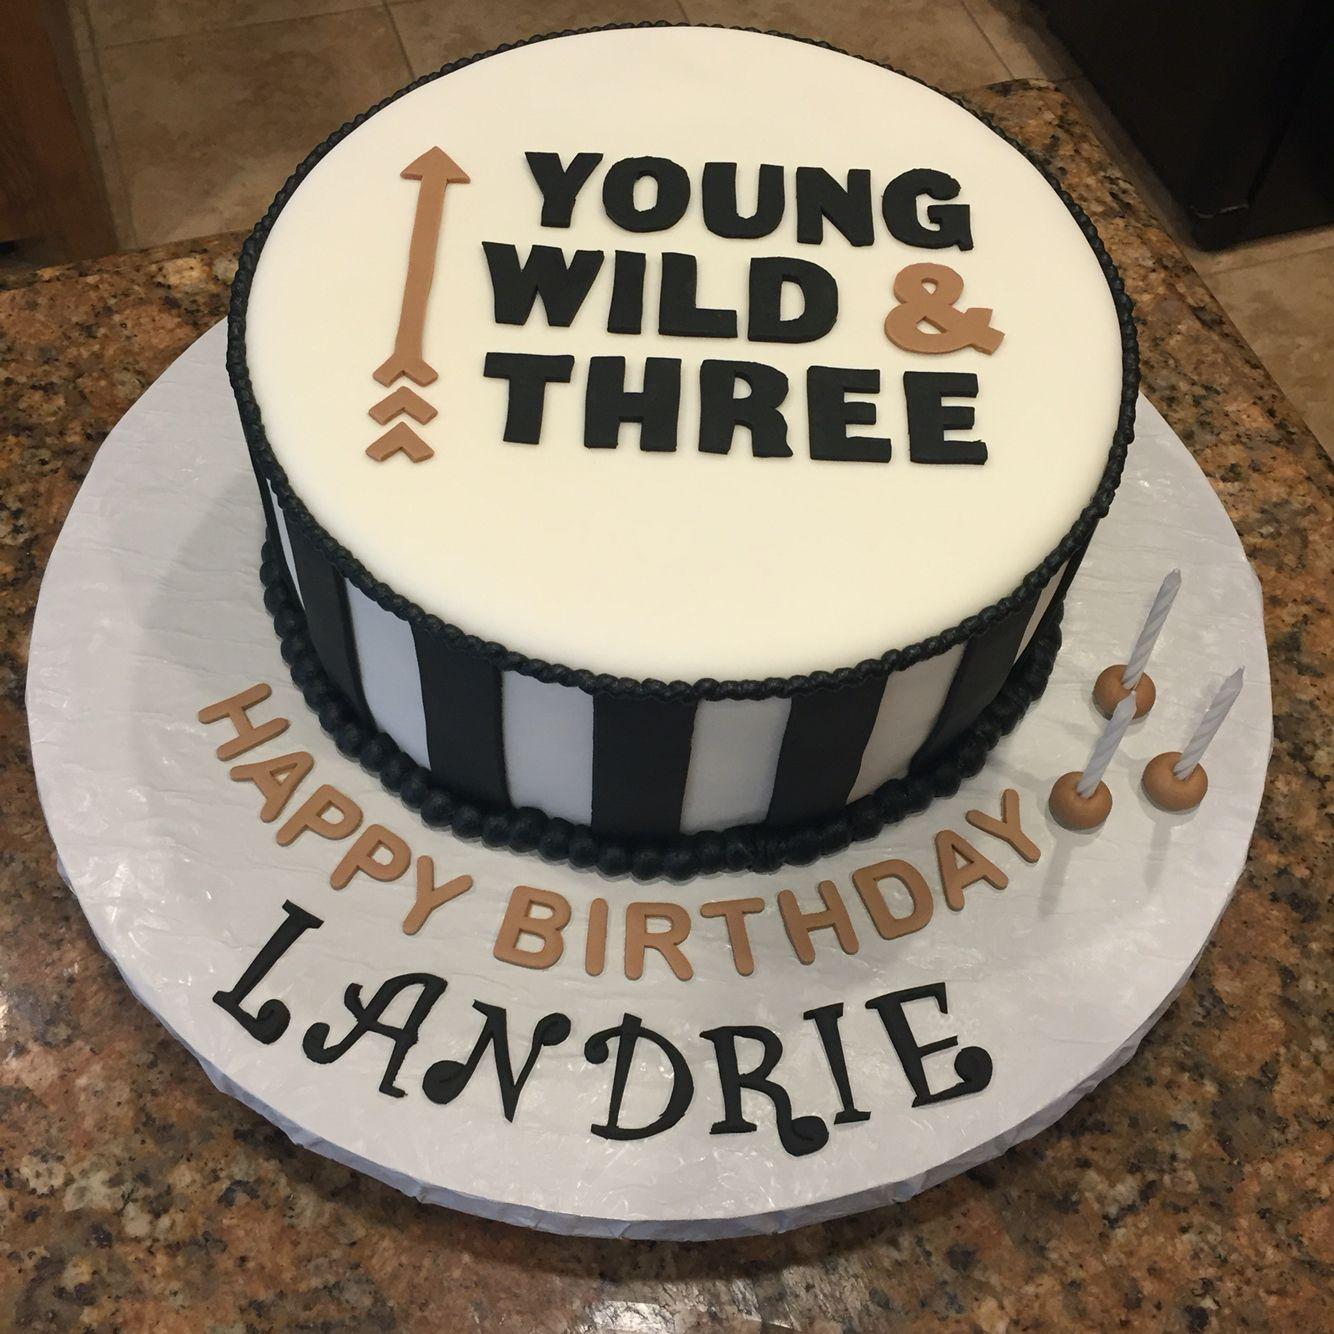 Young wild and three birthday cake My Cakes Pinterest